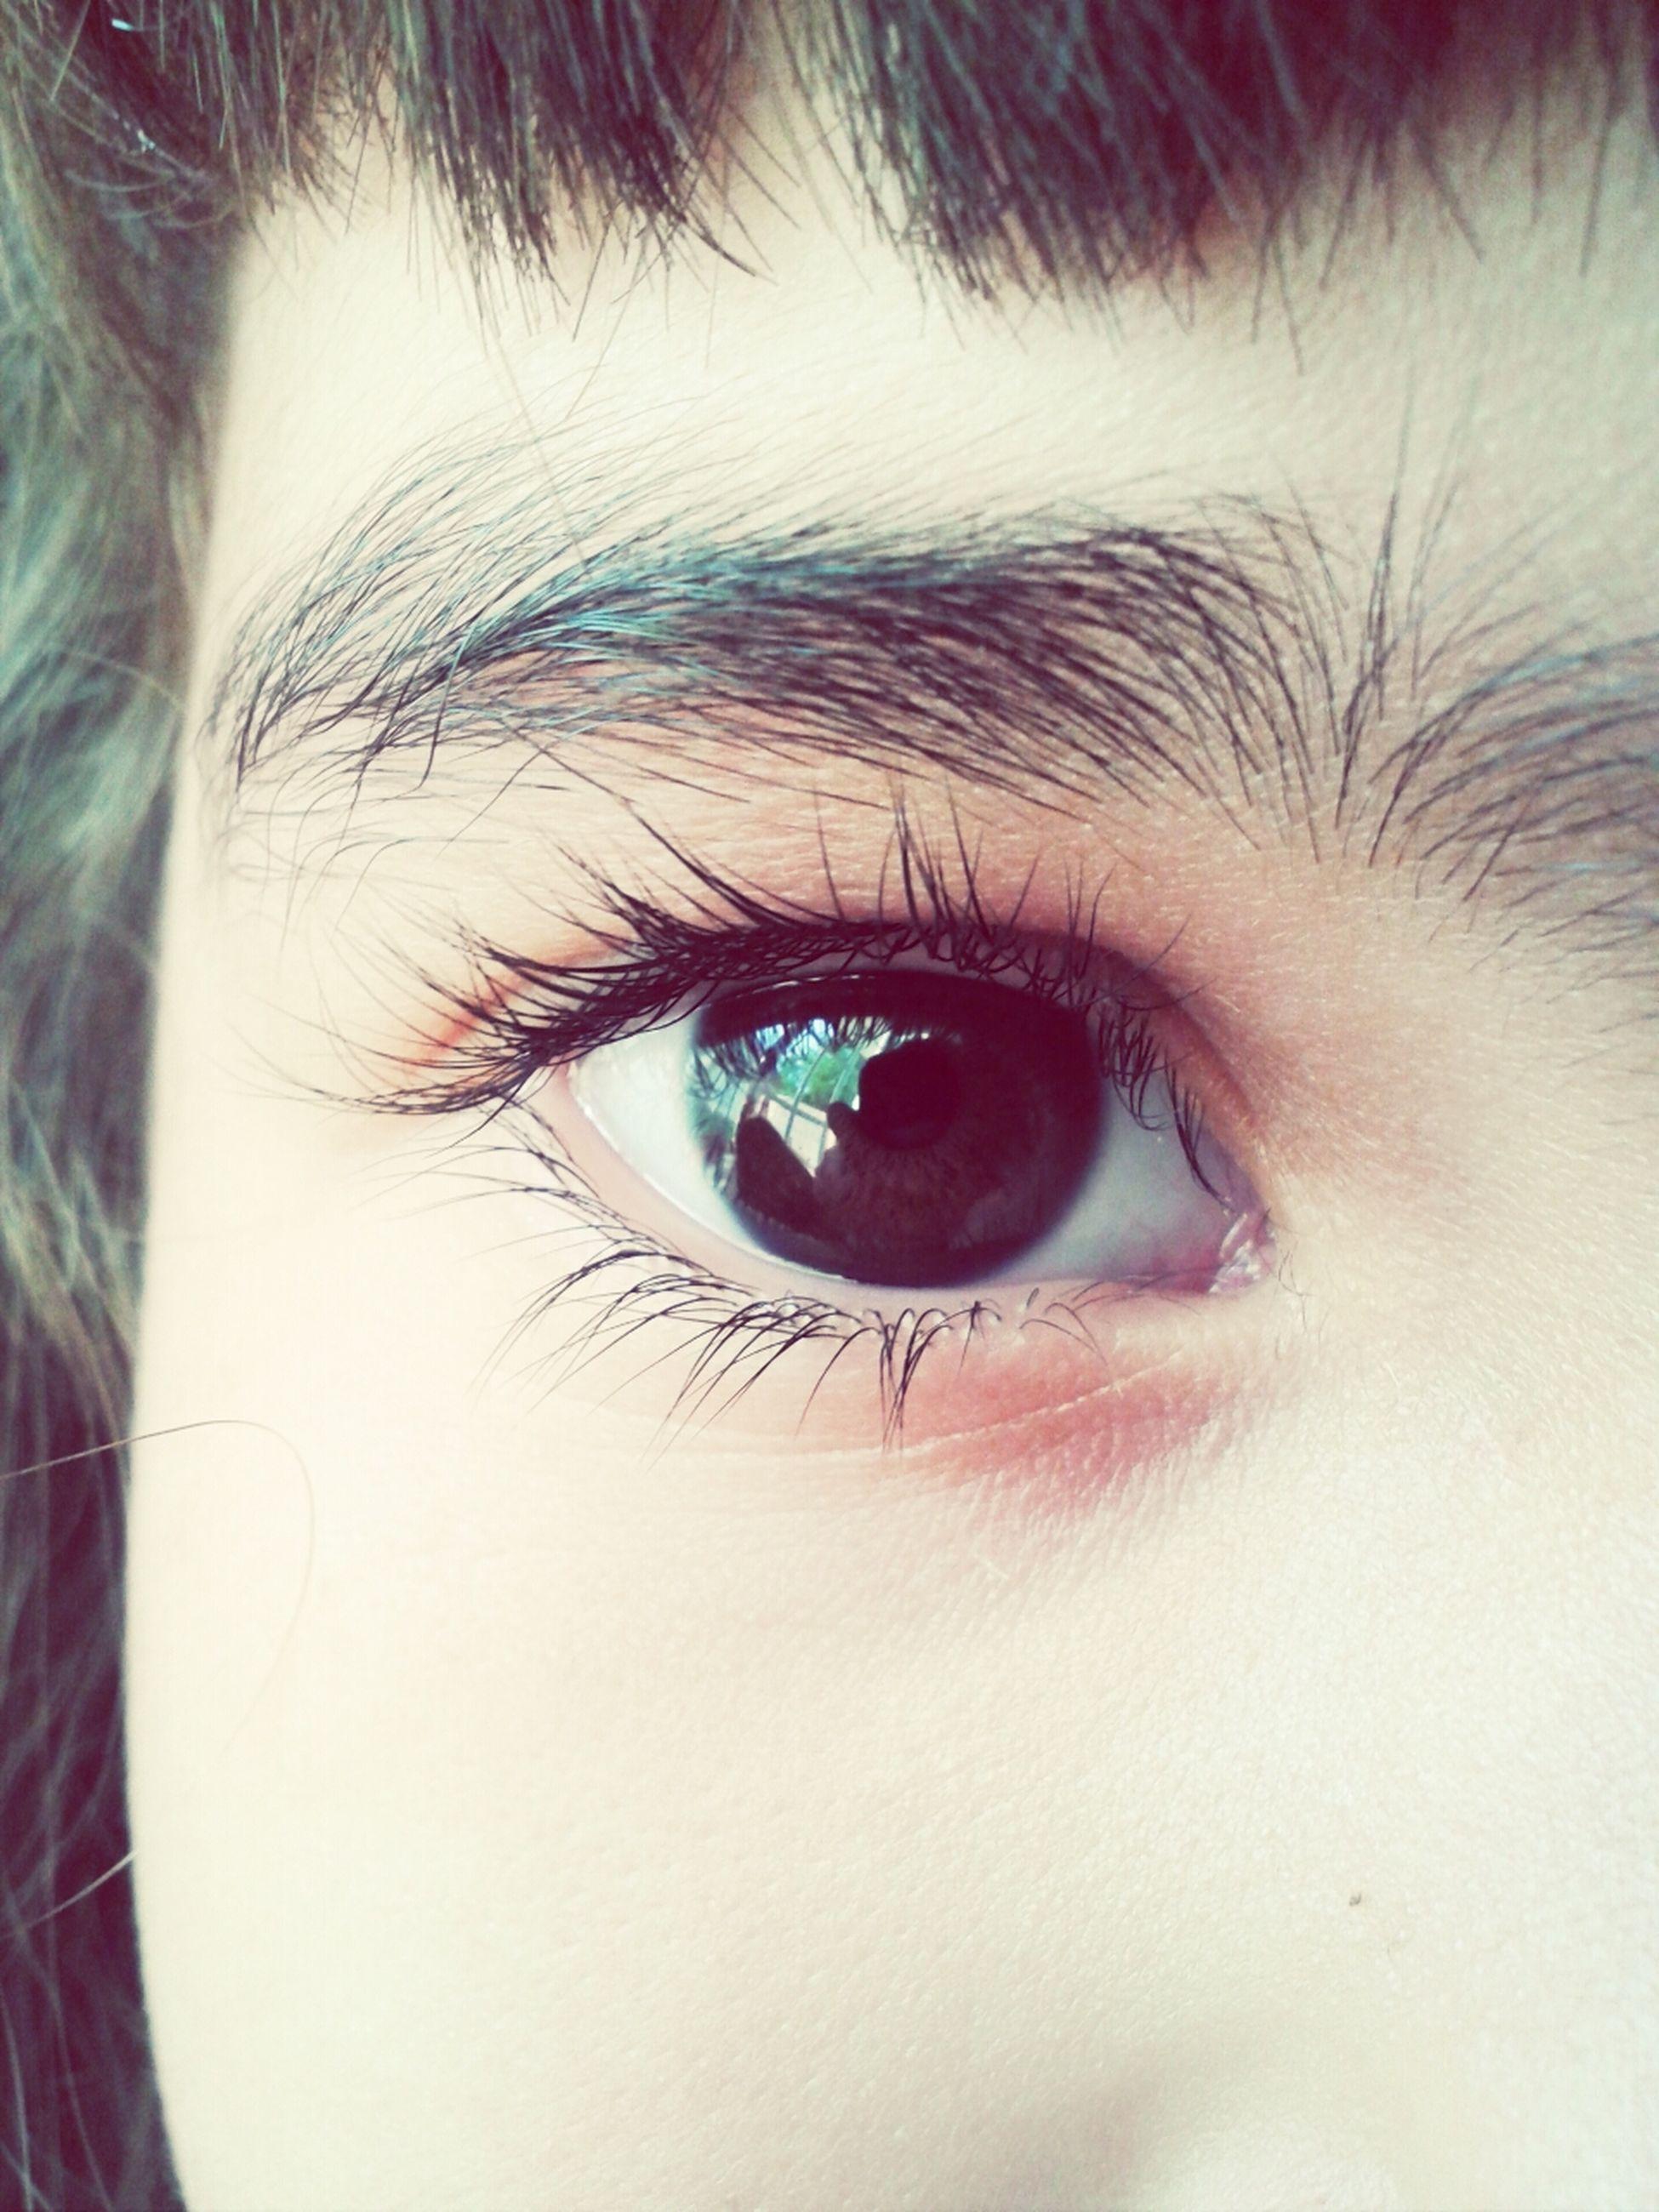 human eye, eyelash, close-up, eyesight, part of, sensory perception, iris - eye, eyeball, extreme close-up, human skin, looking at camera, lifestyles, person, human face, extreme close up, full frame, portrait